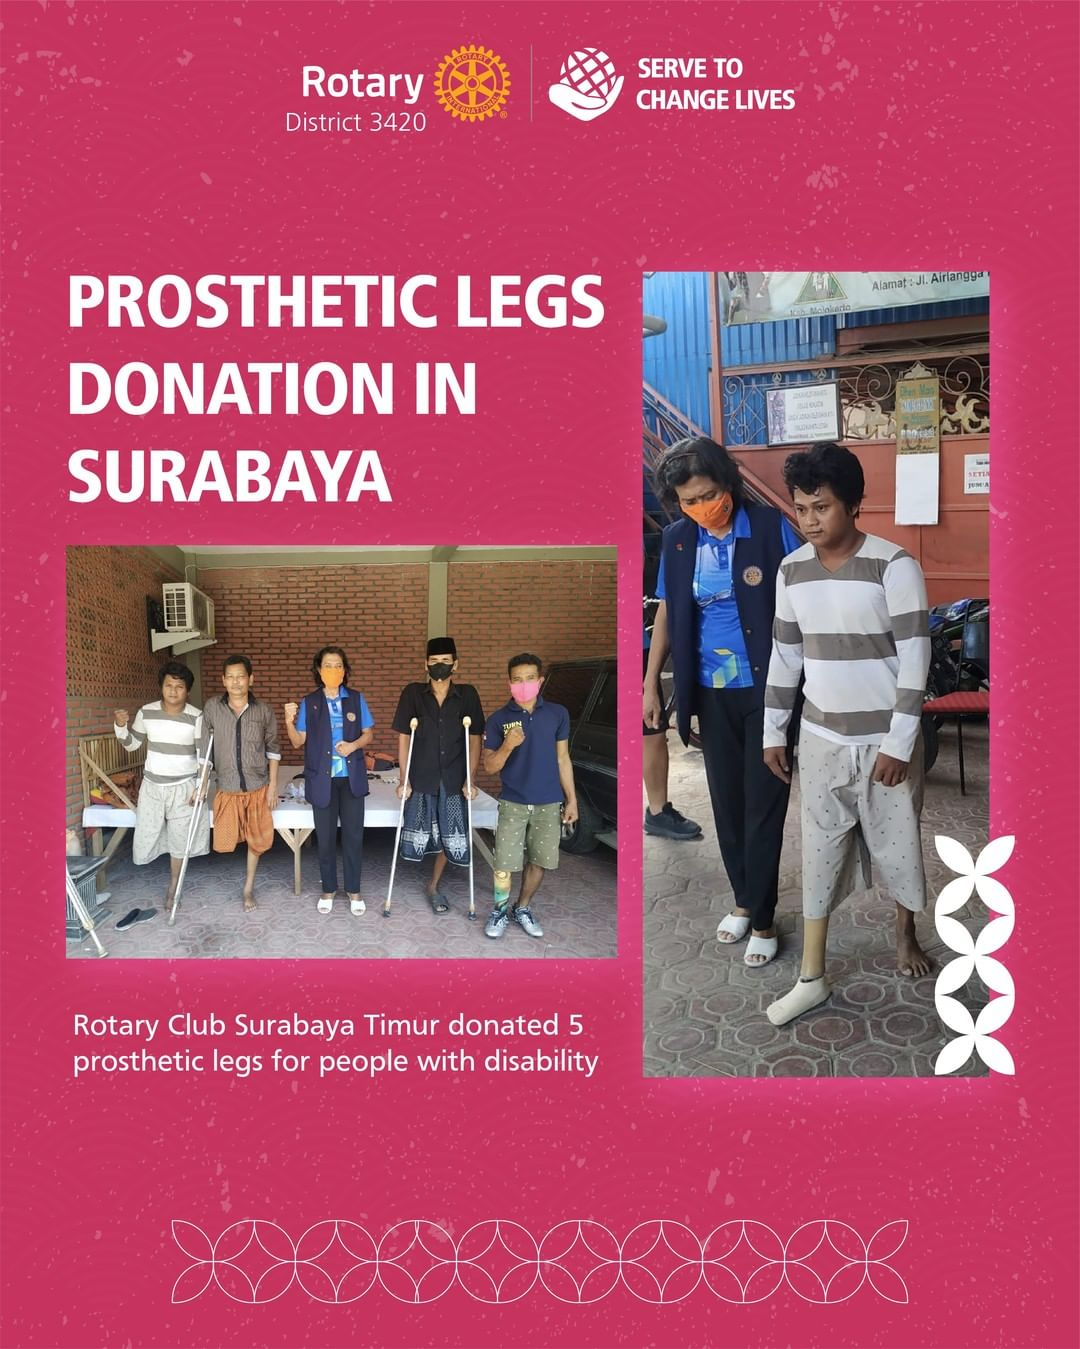 Prosthetic Legs Donation in Surabaya